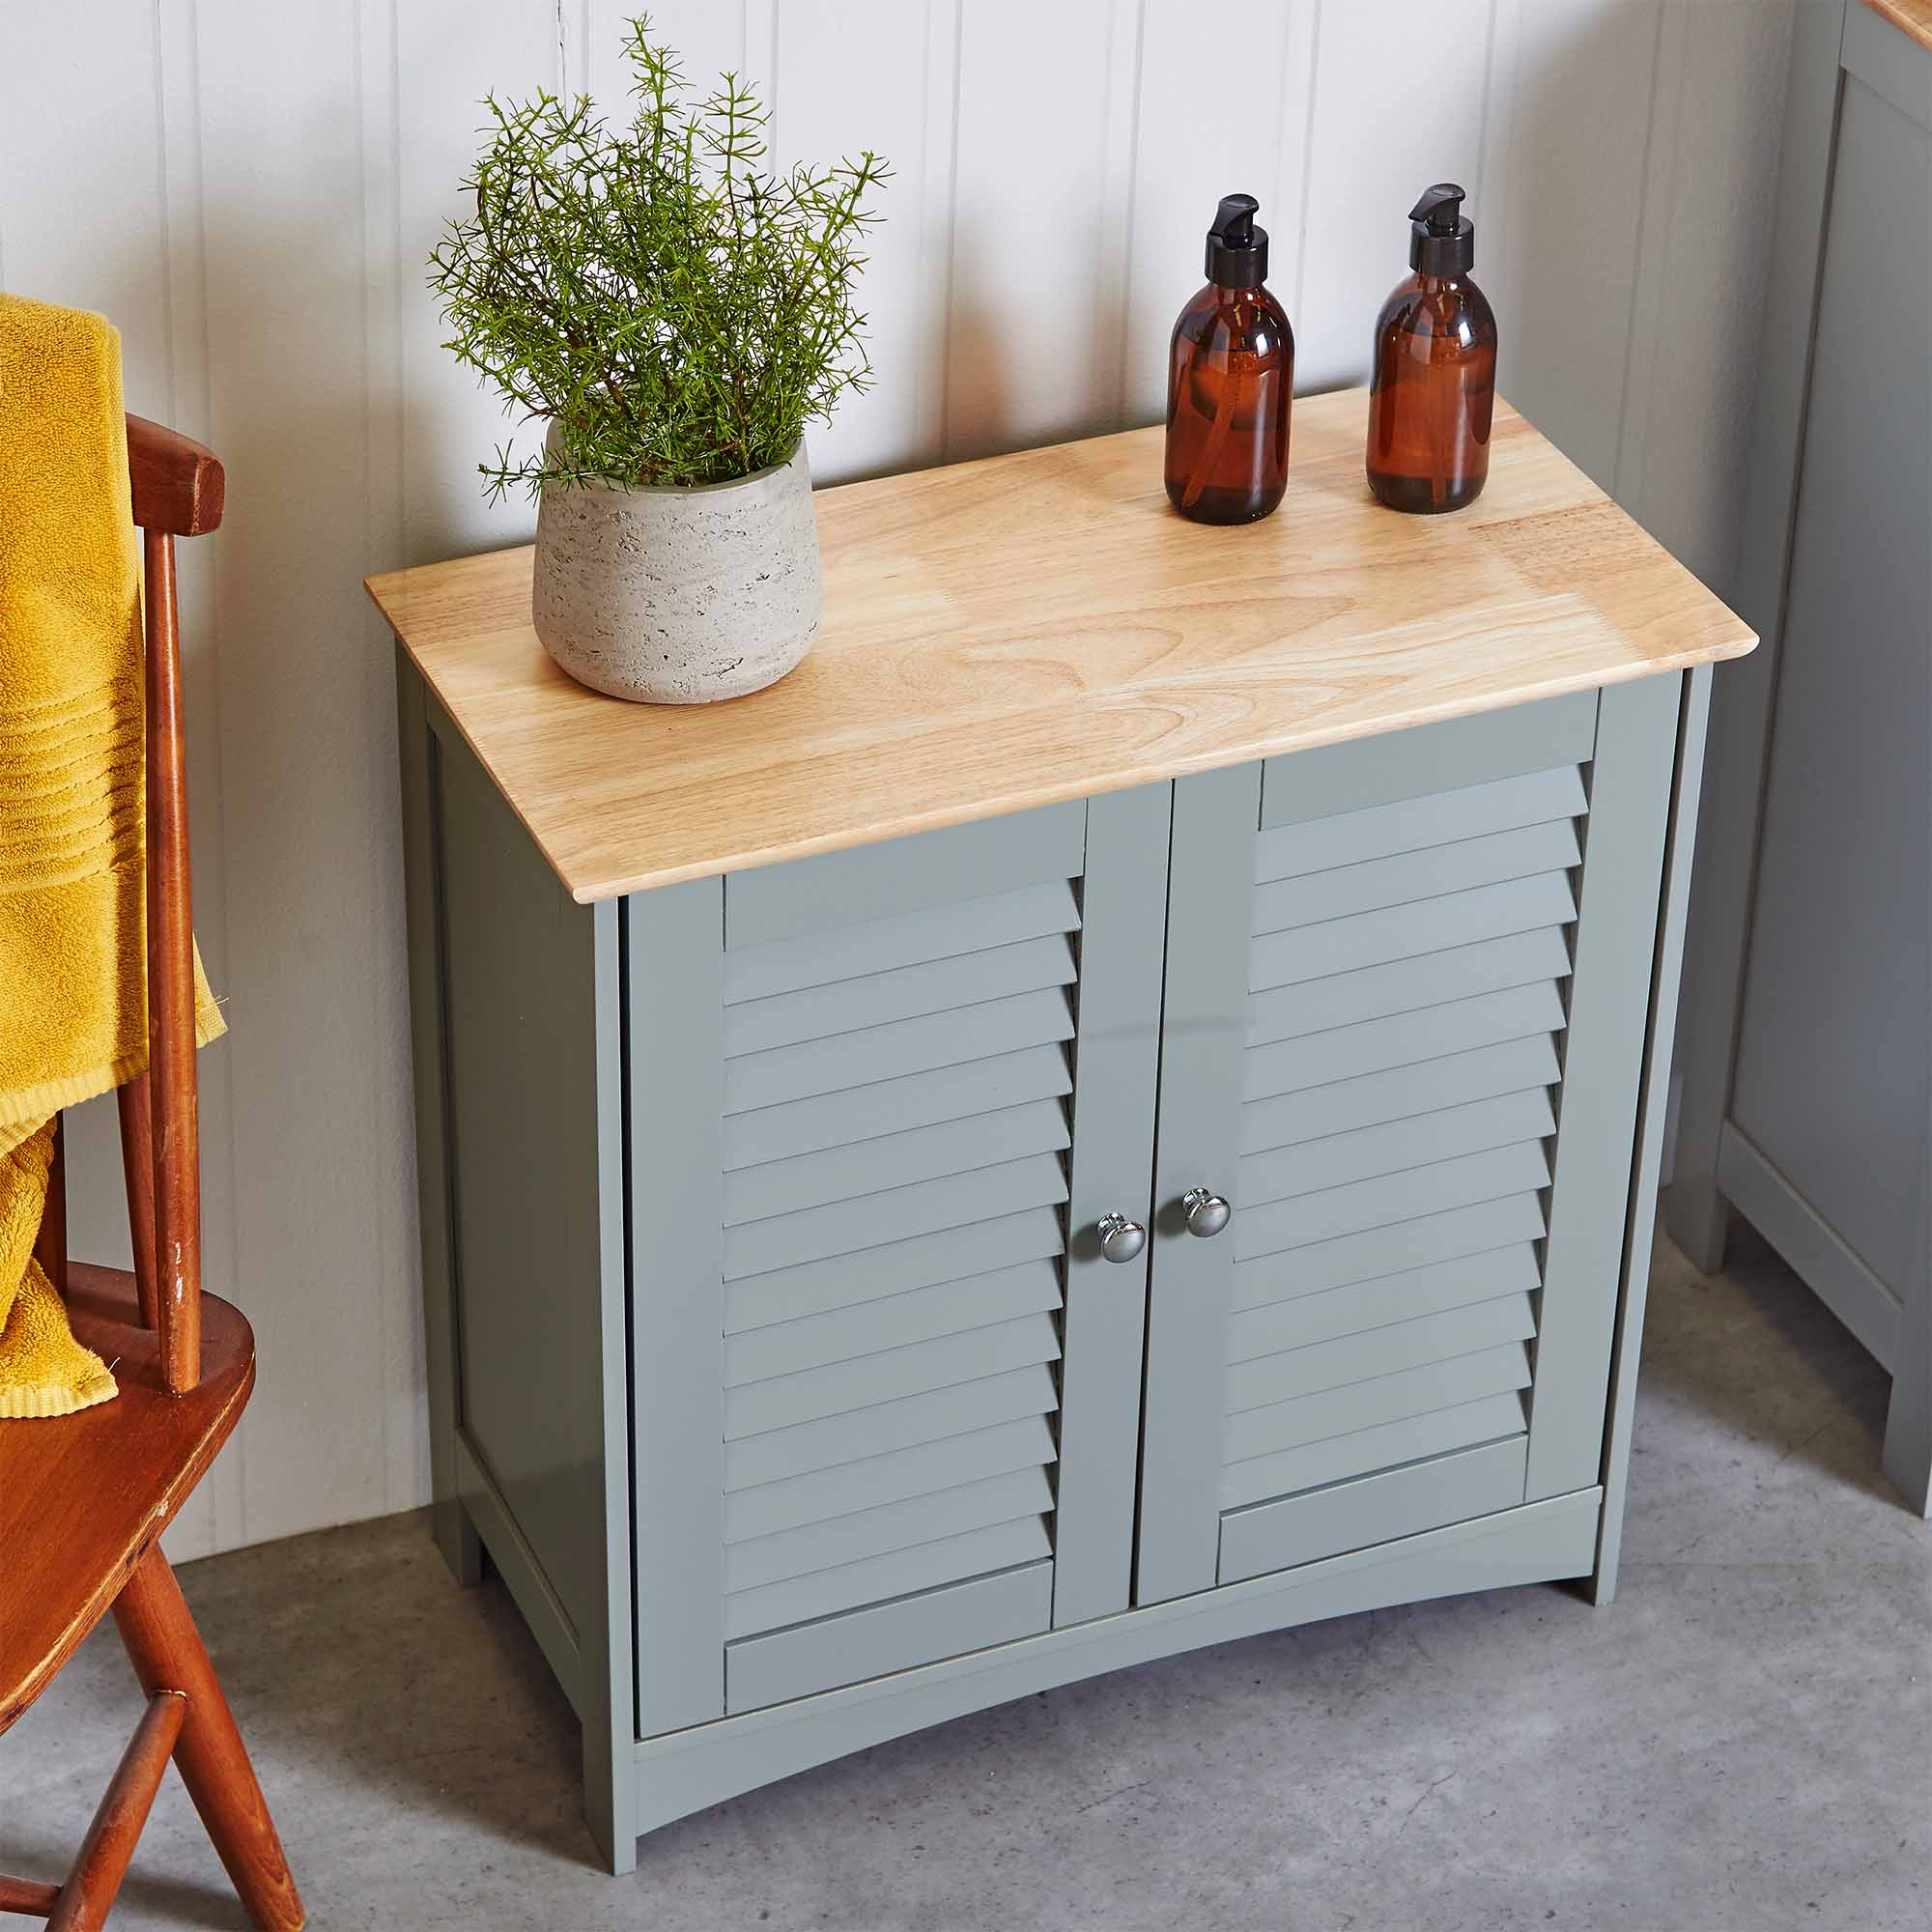 VonHaus Towel Cabinet Floor Standing Unit 2 Shelves And